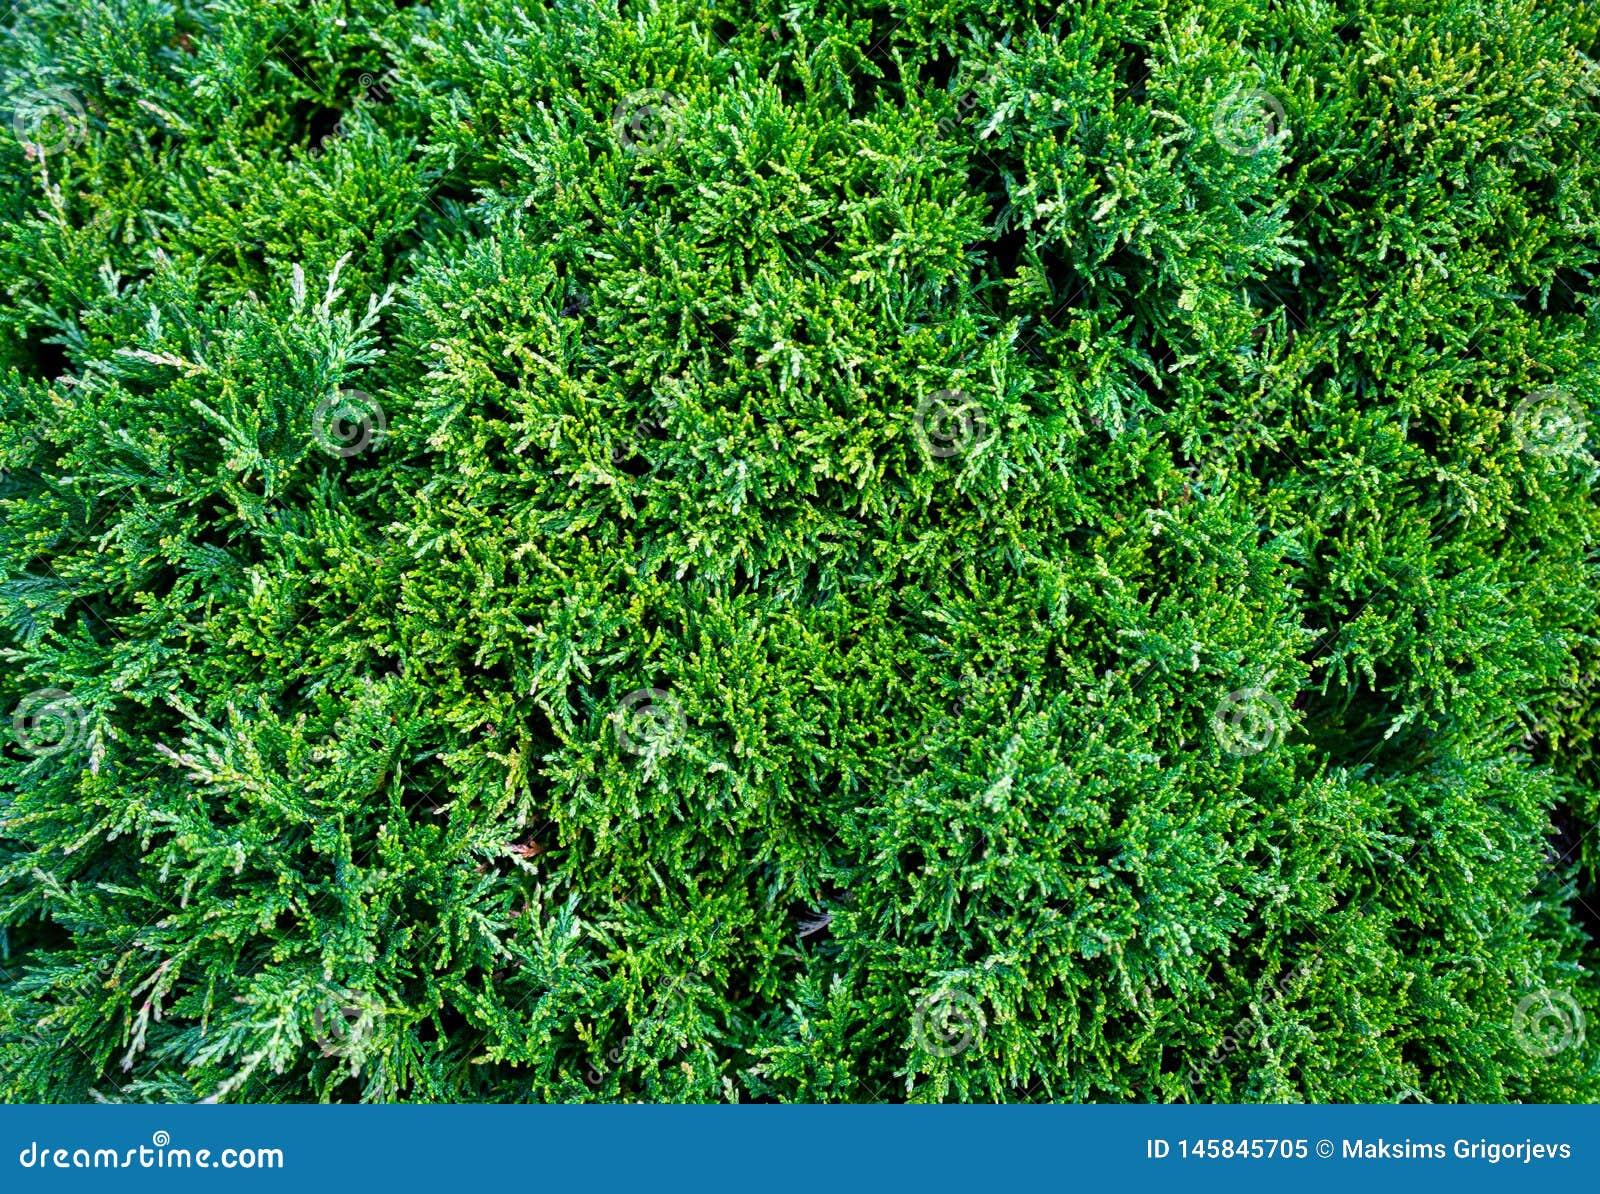 Les occidentalis de Thuja d Arborvitae est un arbre conif?re ? feuilles persistantes